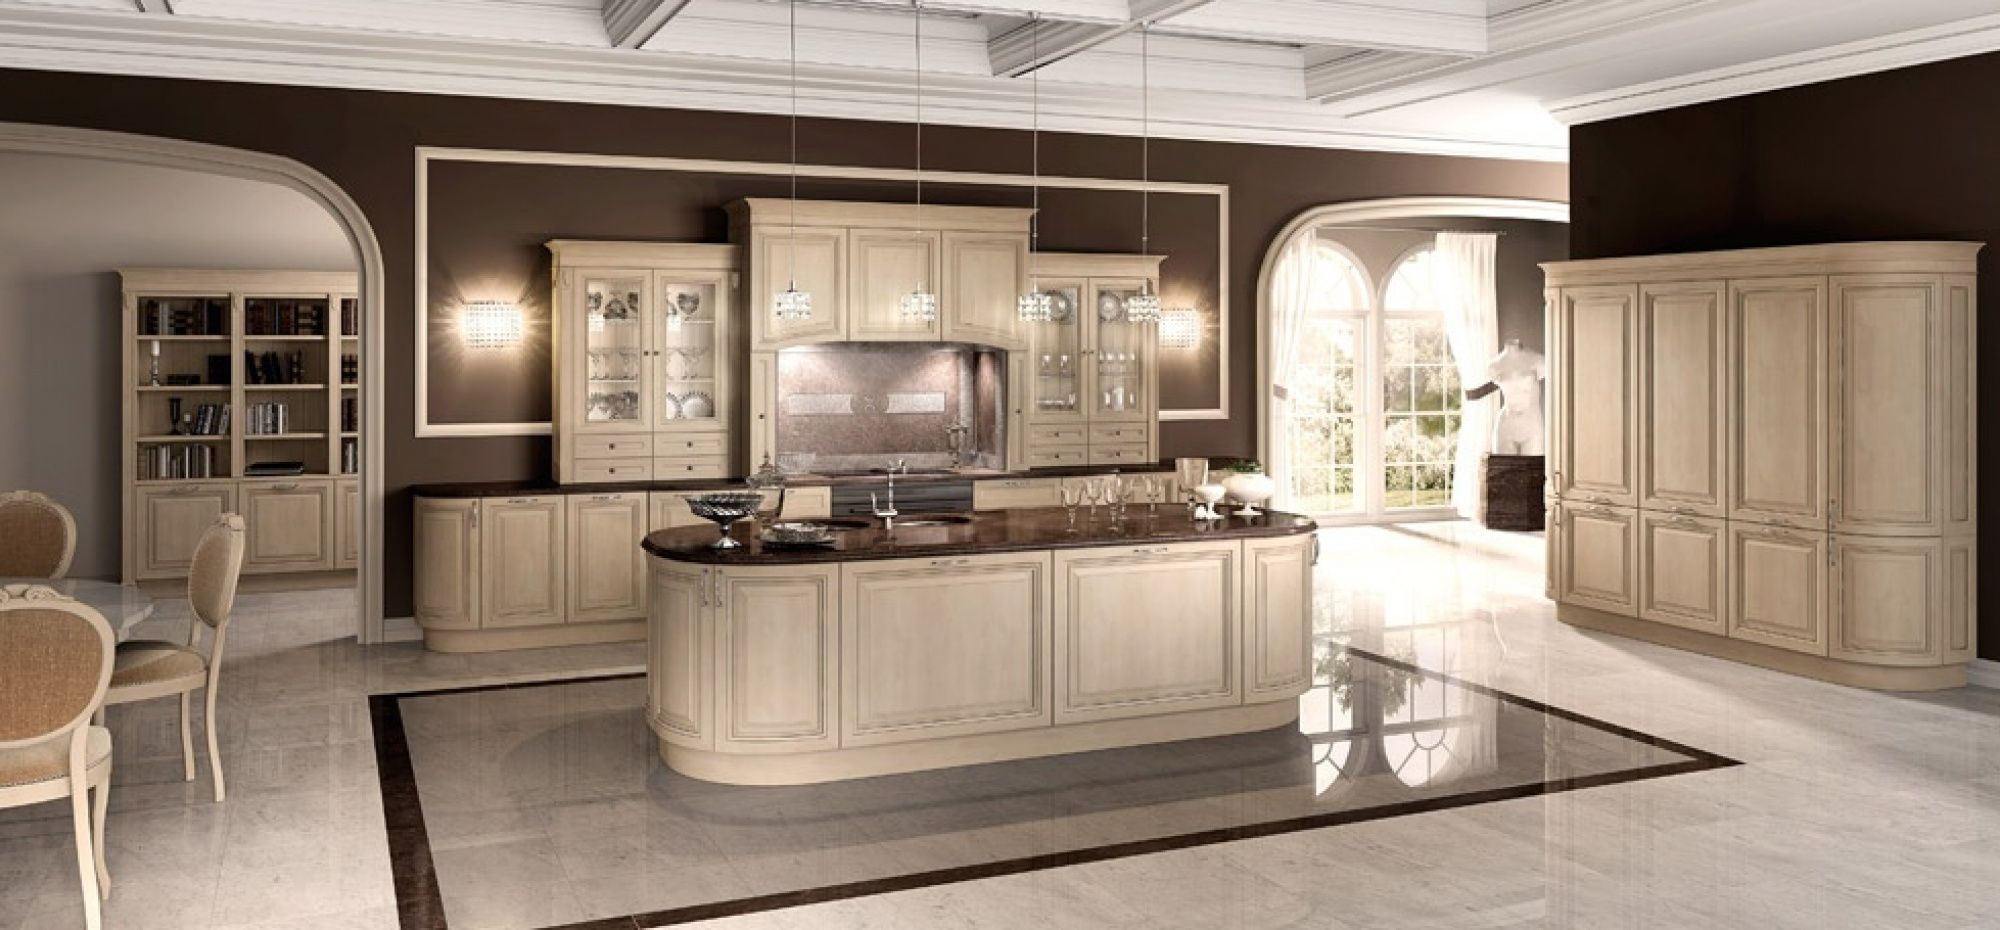 Florence • Cucine classiche by Berloni, kitchen | Espaces de la ...